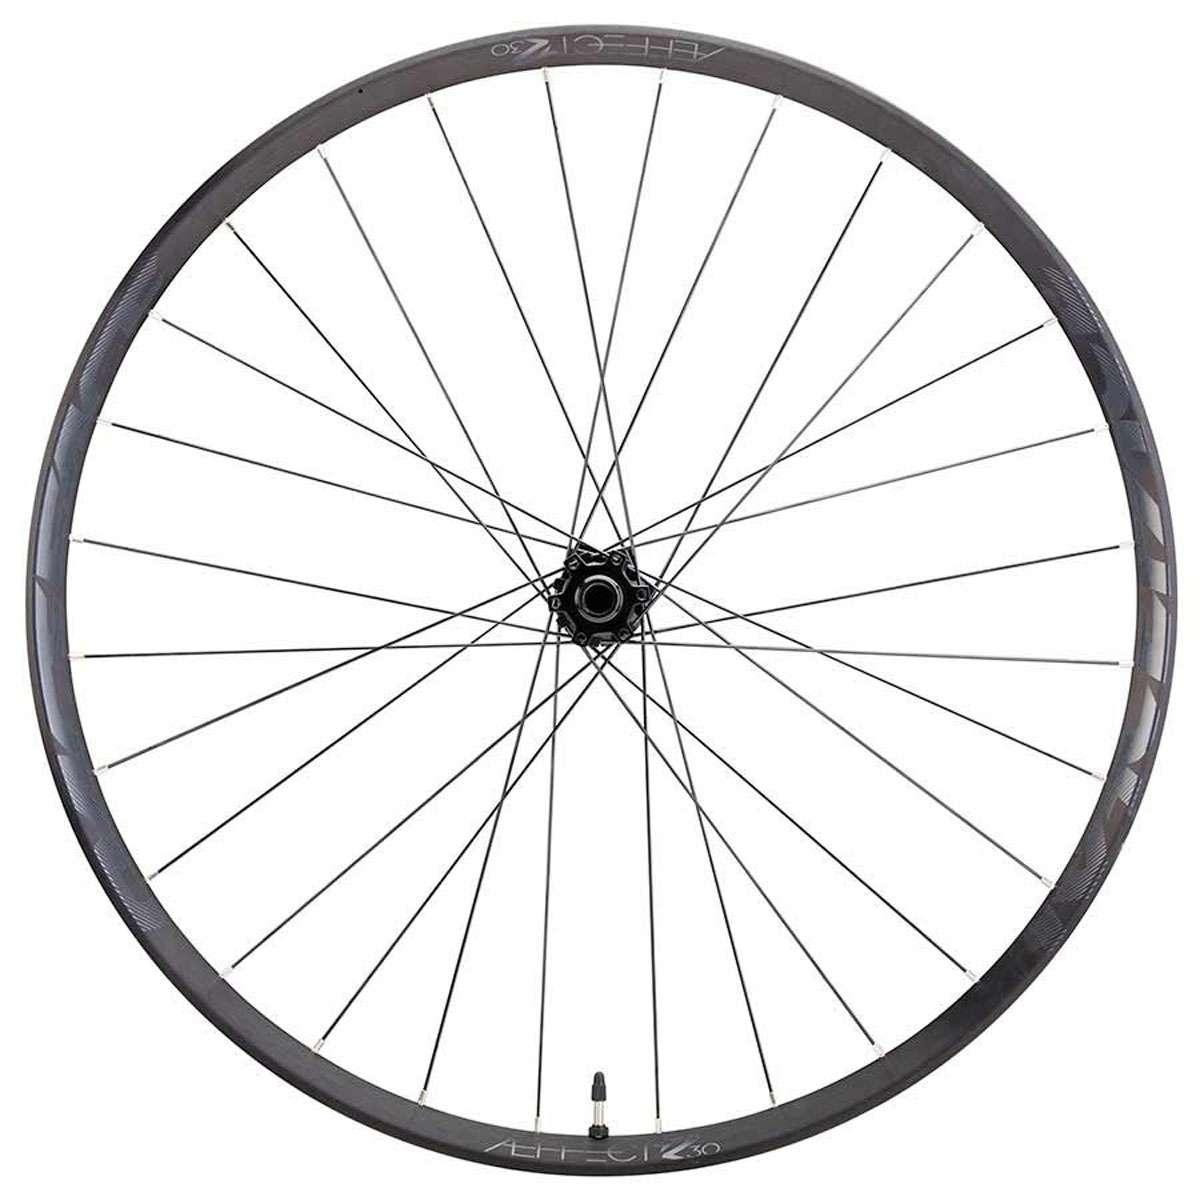 Race Face Race Face, Aeffect SL, Wheel, Rear, 29'' / 622, Holes: F: 24, R: 24, 12mm TA, 148mm, Disc IS 6-bolt, SRAM XD